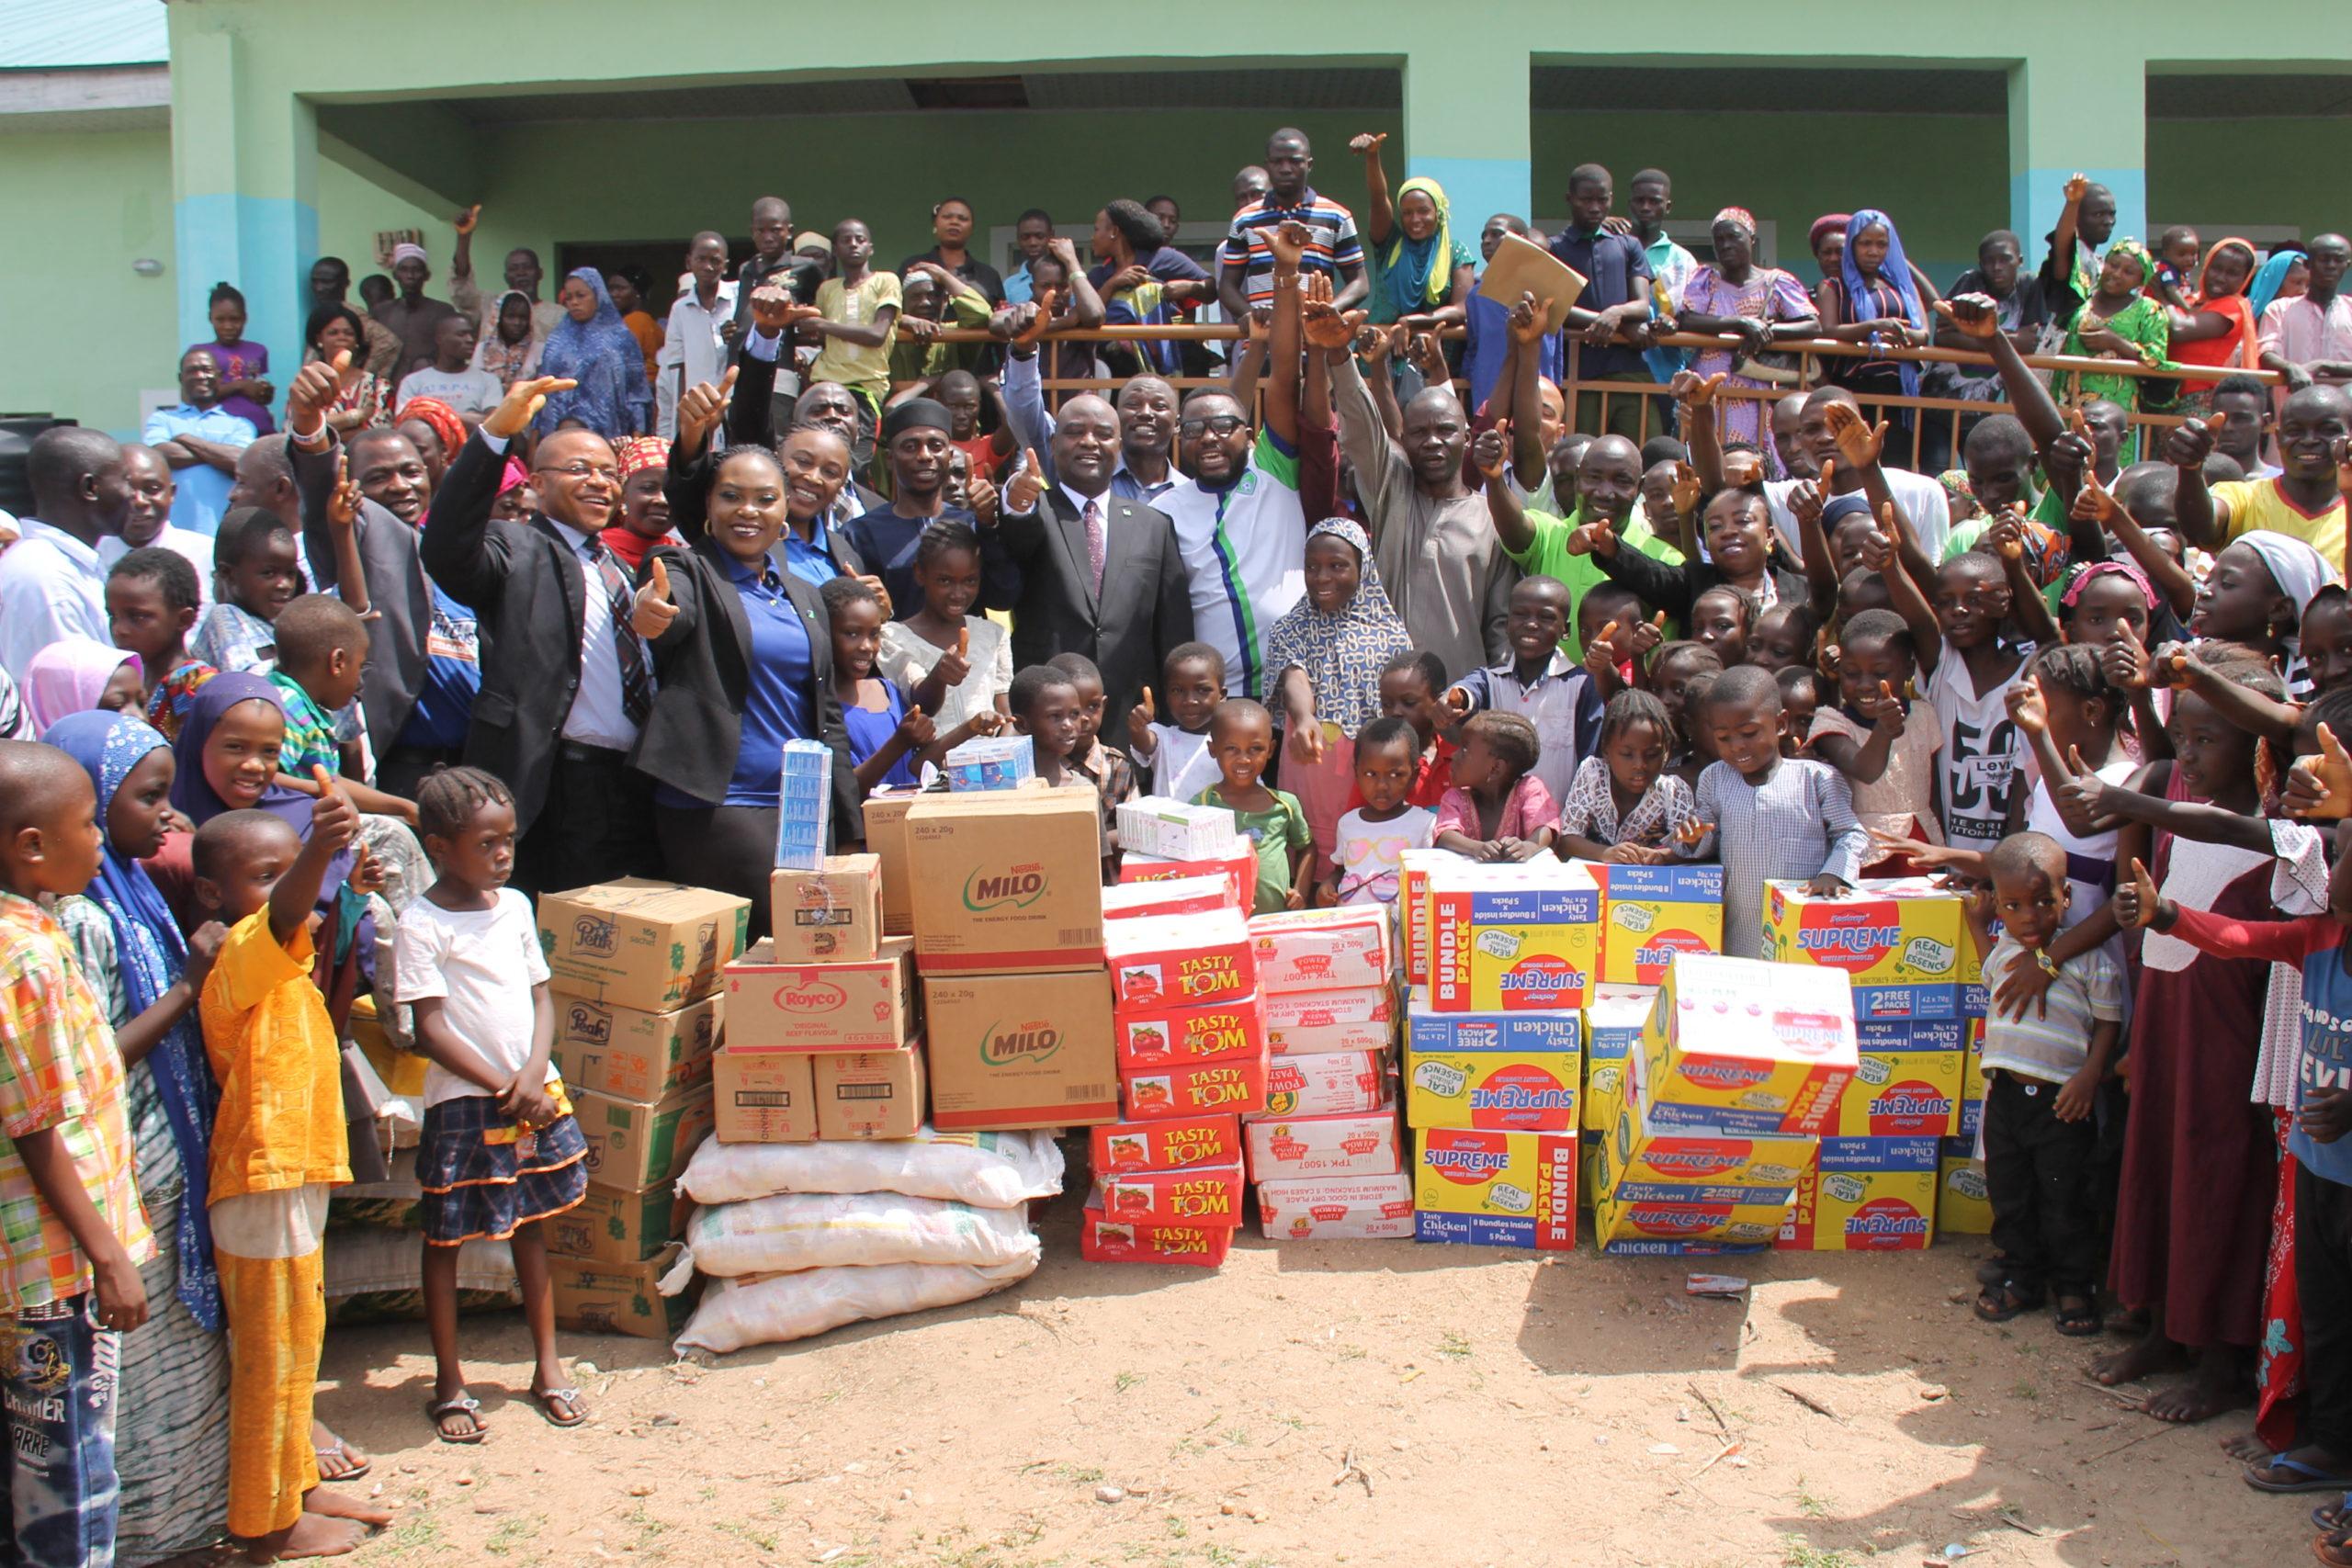 fidelity bank Abuja 2 Regional Bank Donates essential items to flood victims in Lokoja, Kogi State (3)